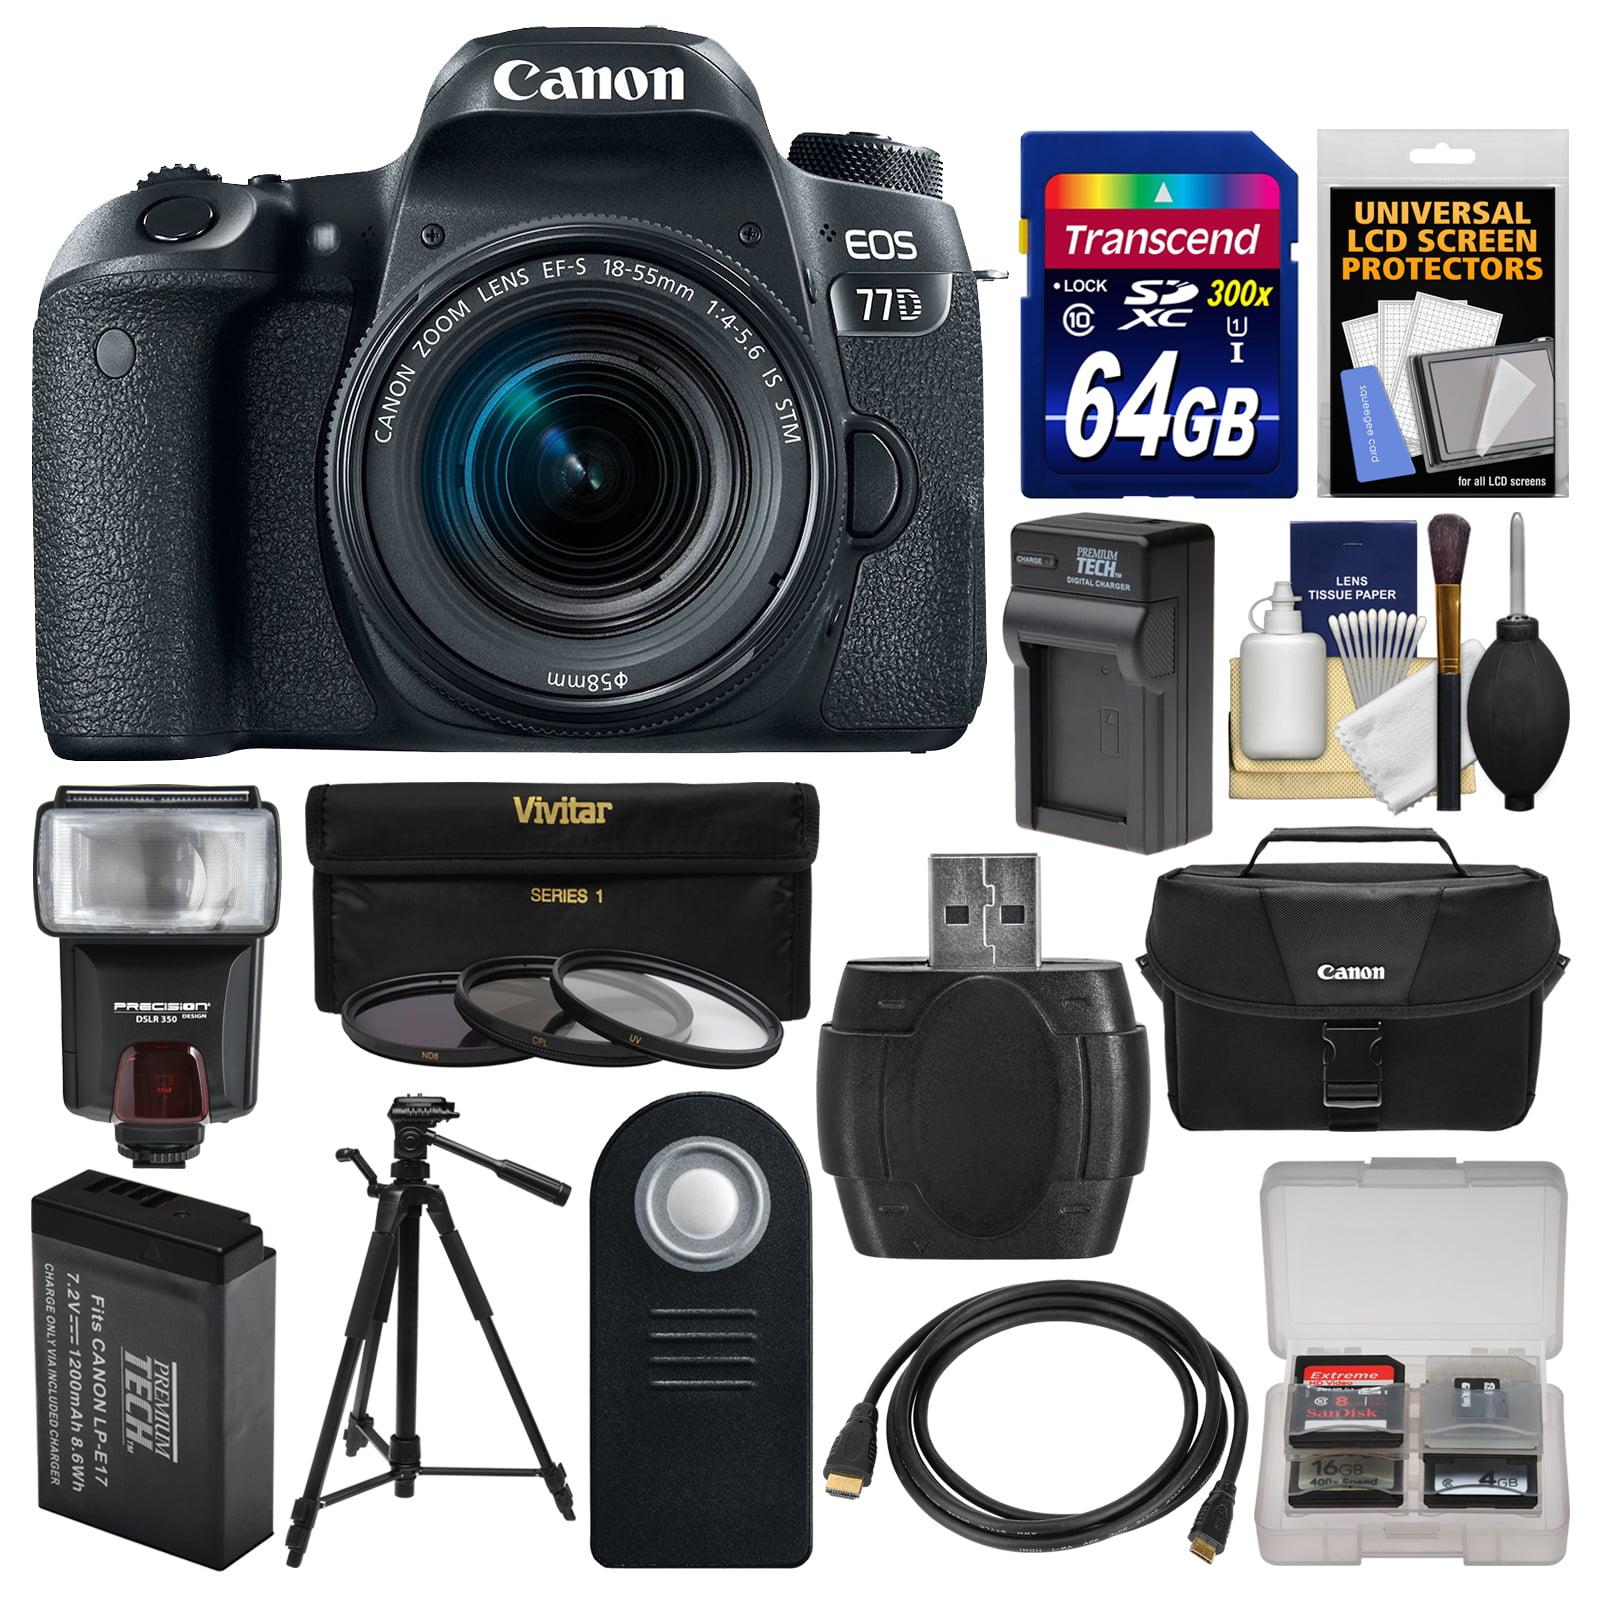 Canon EOS 77D Wi-Fi Digital SLR Camera & EF-S 18-55mm IS ...